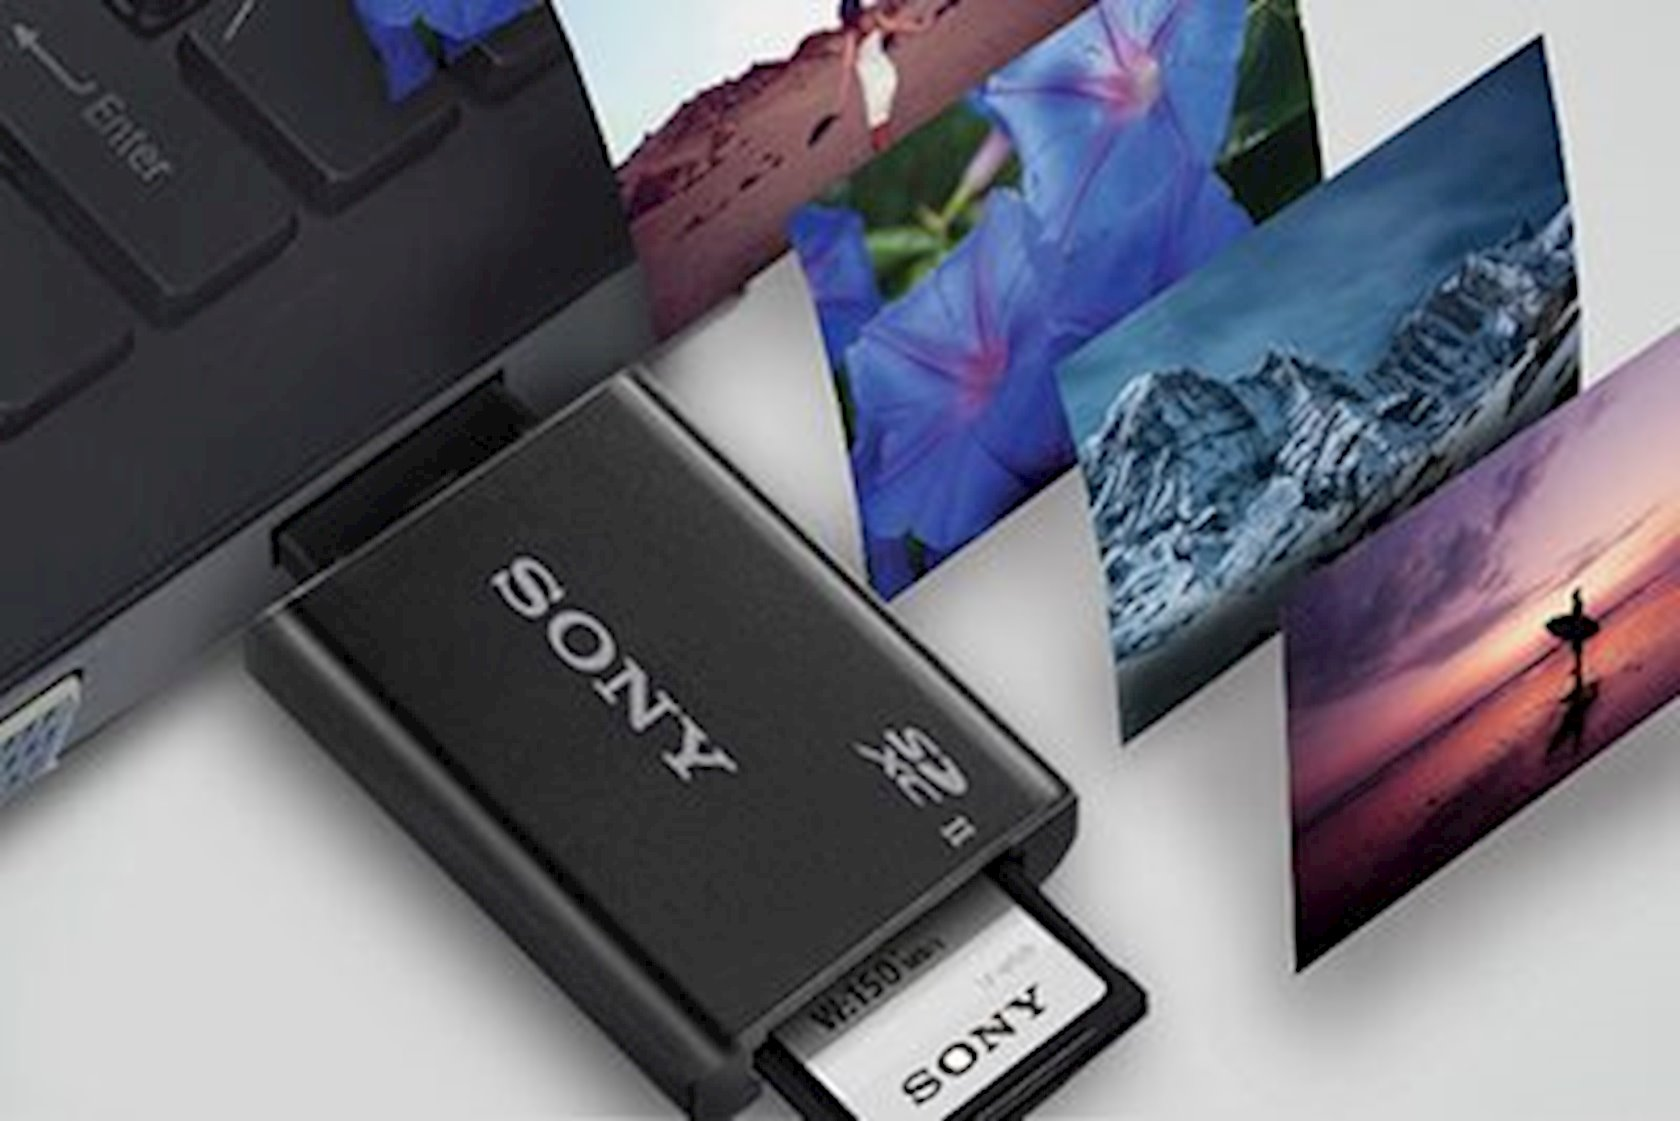 Yaddaş kartı Sony SF-E64/T1 ET4 64GB